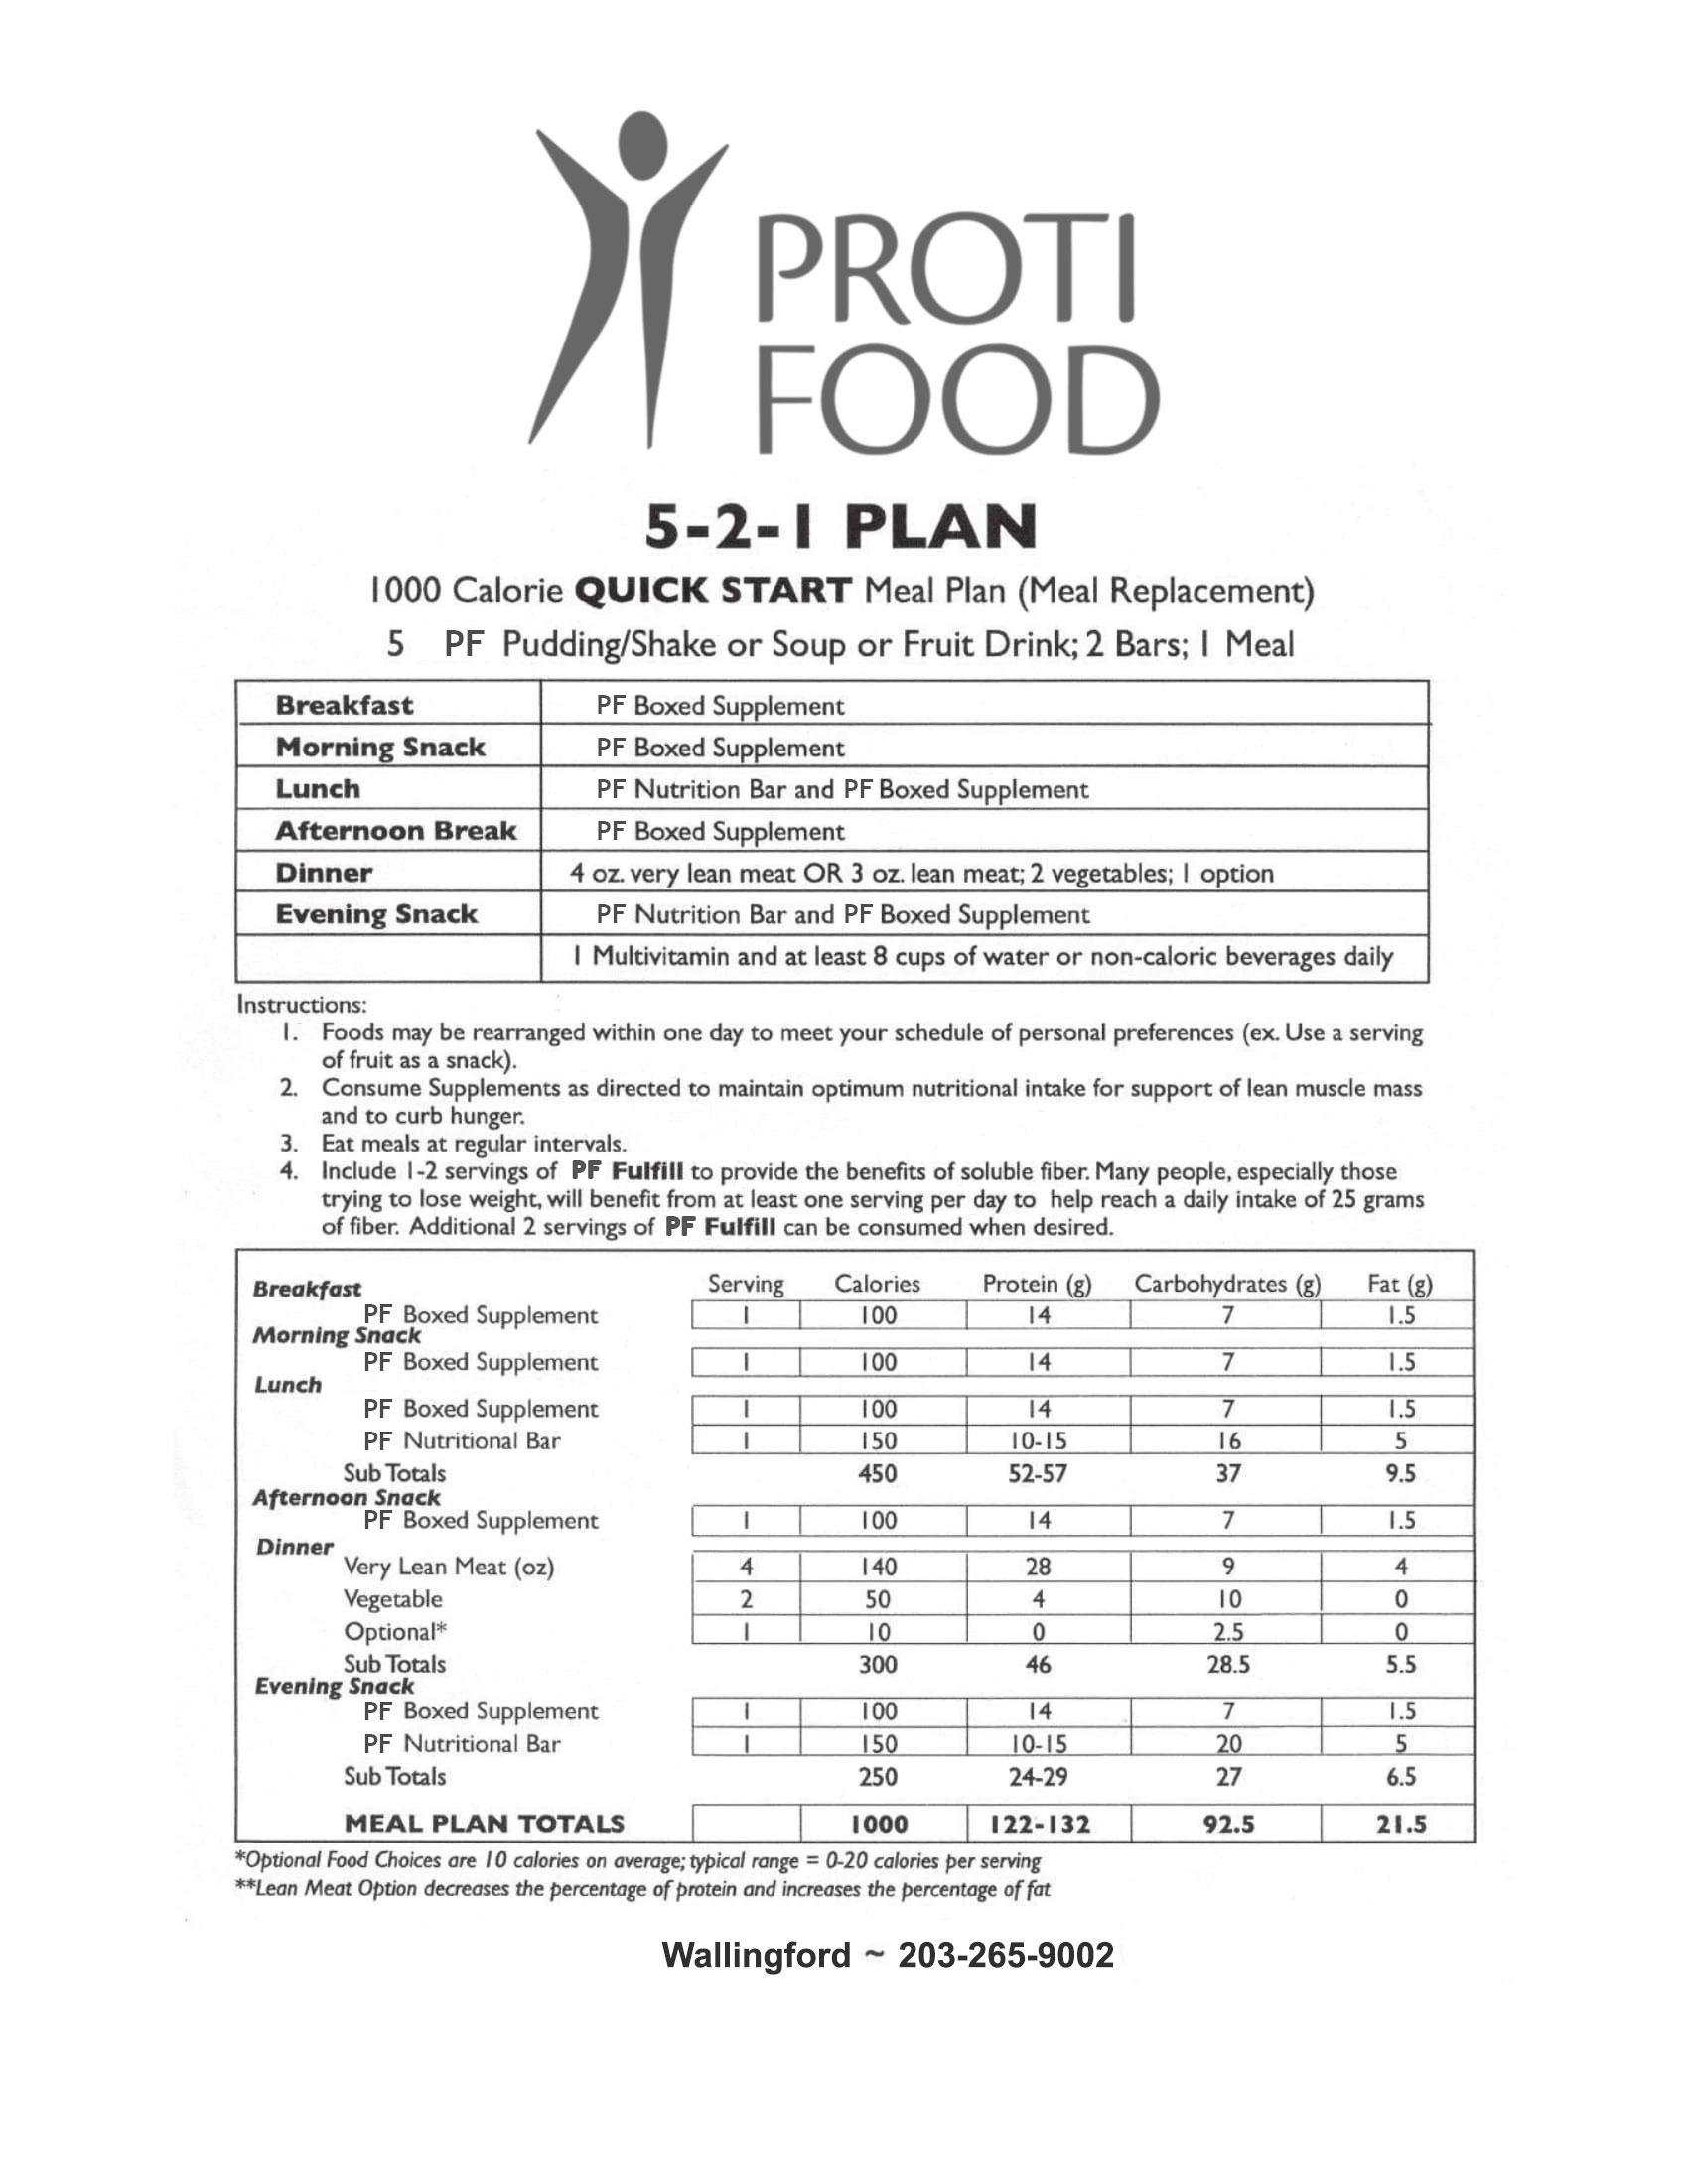 521-plan-pf-3.jpg